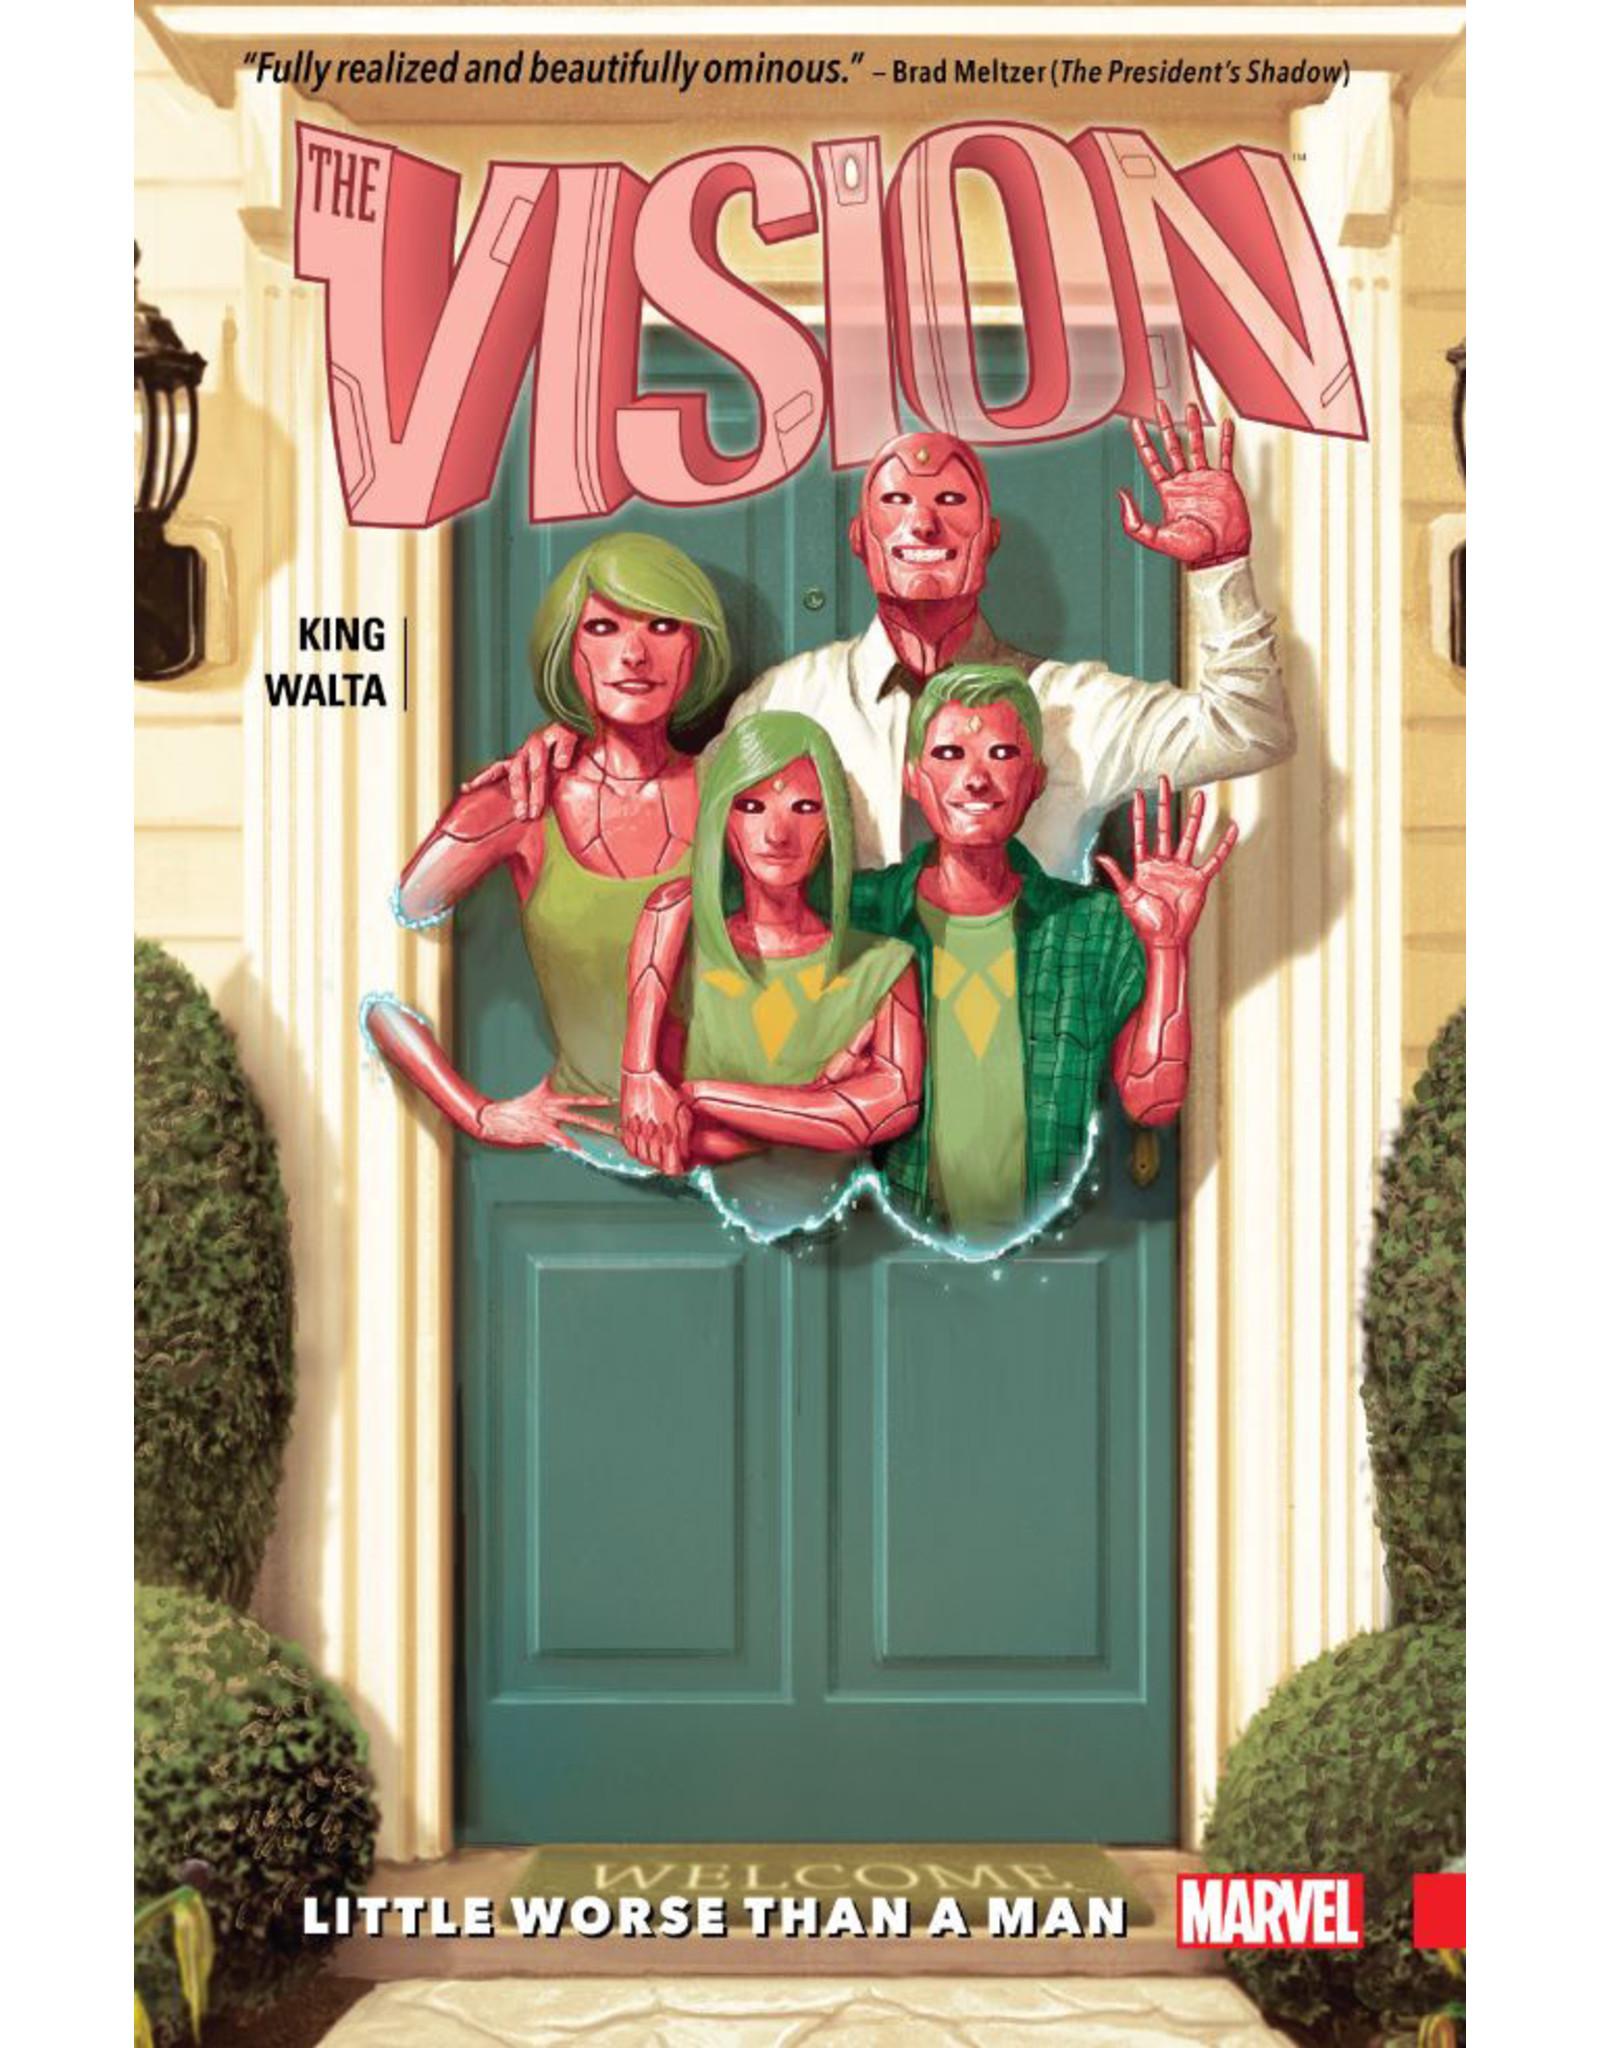 MARVEL COMICS VISION TP VOL 01 LITTLE WORSE THAN MAN